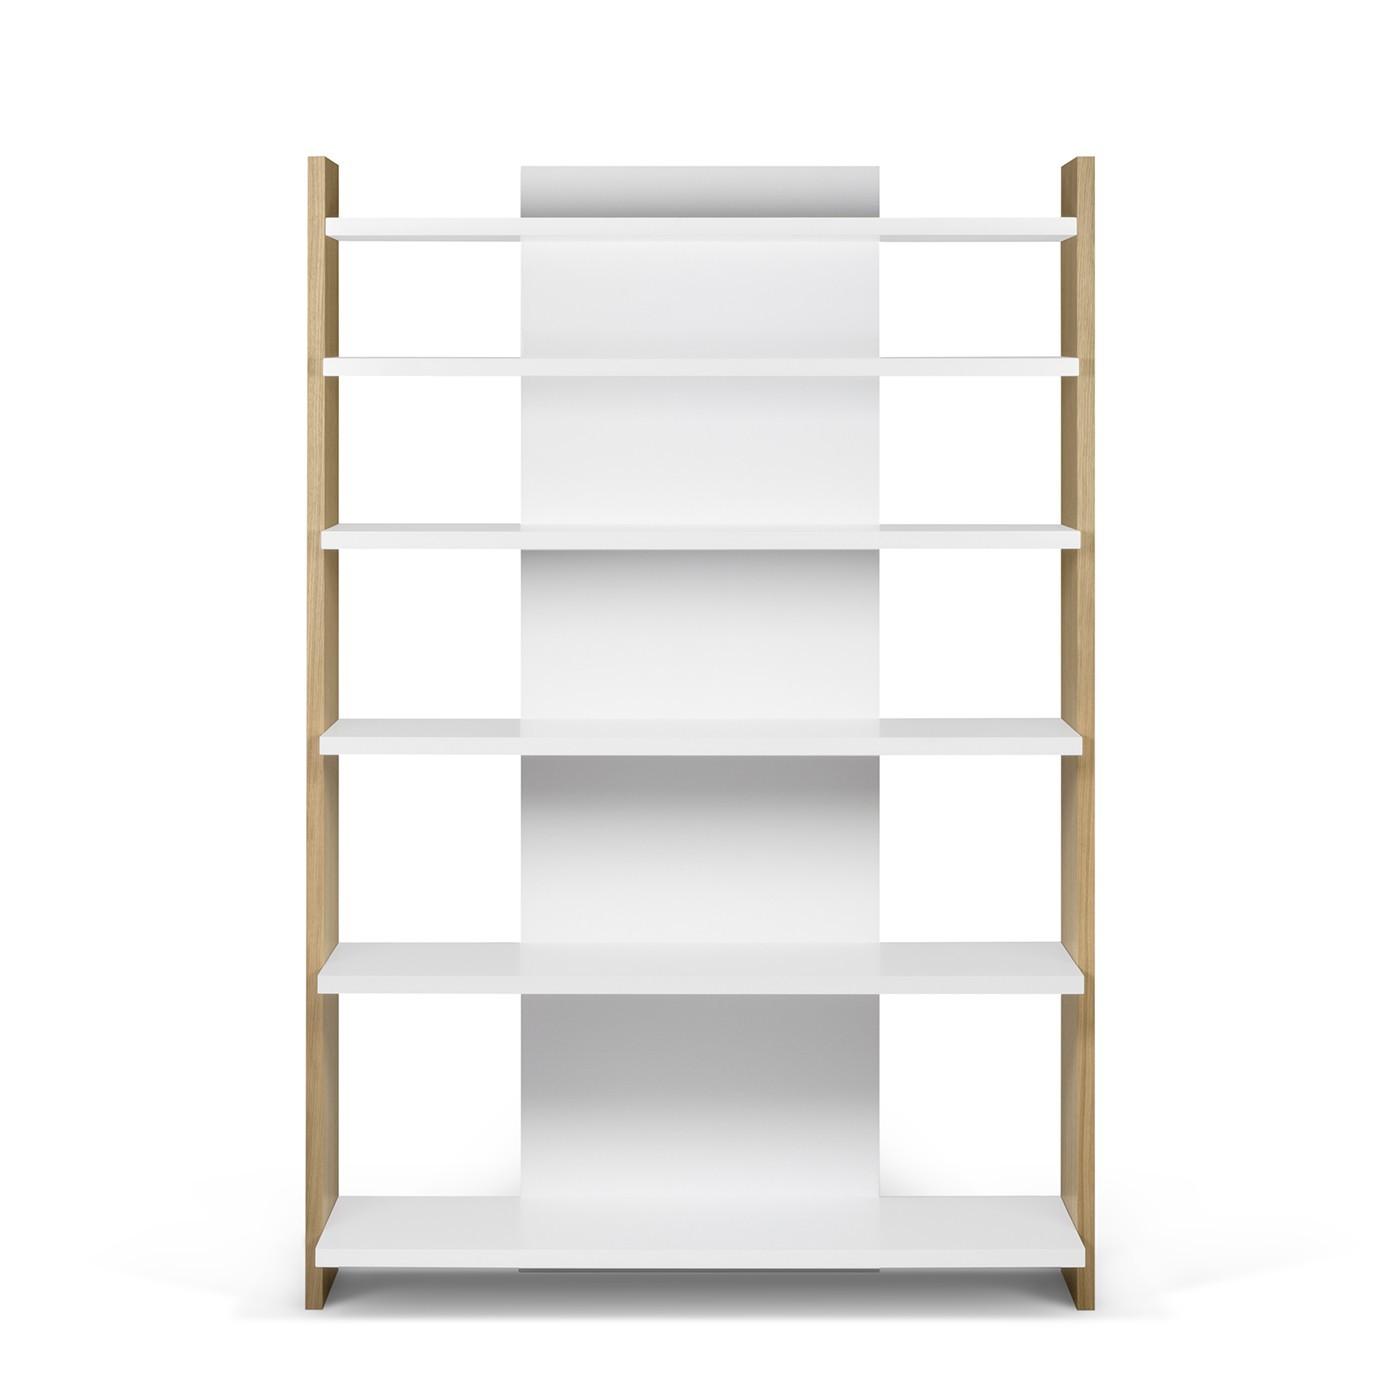 Tundo Niko | Moderne boekenkast | LUMZ